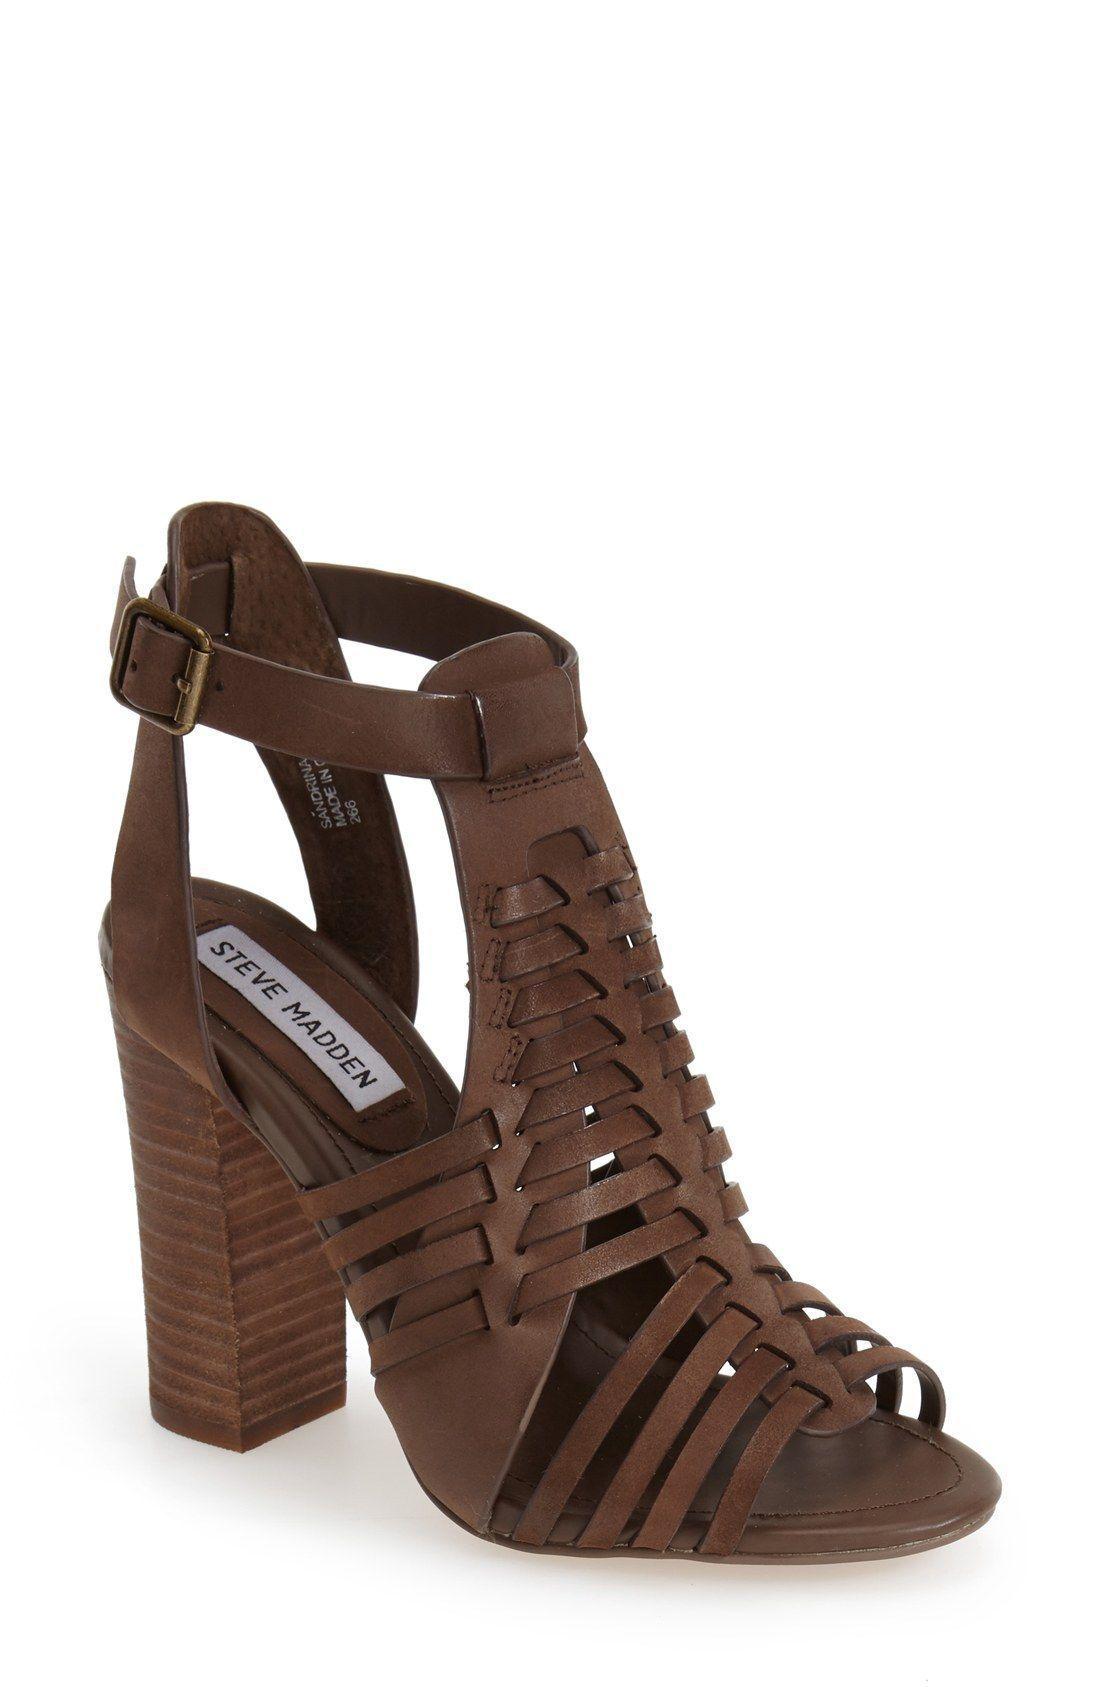 096edac34c4 Free shipping and returns on Steve Madden 'Sandrina' Huarache Sandal ...